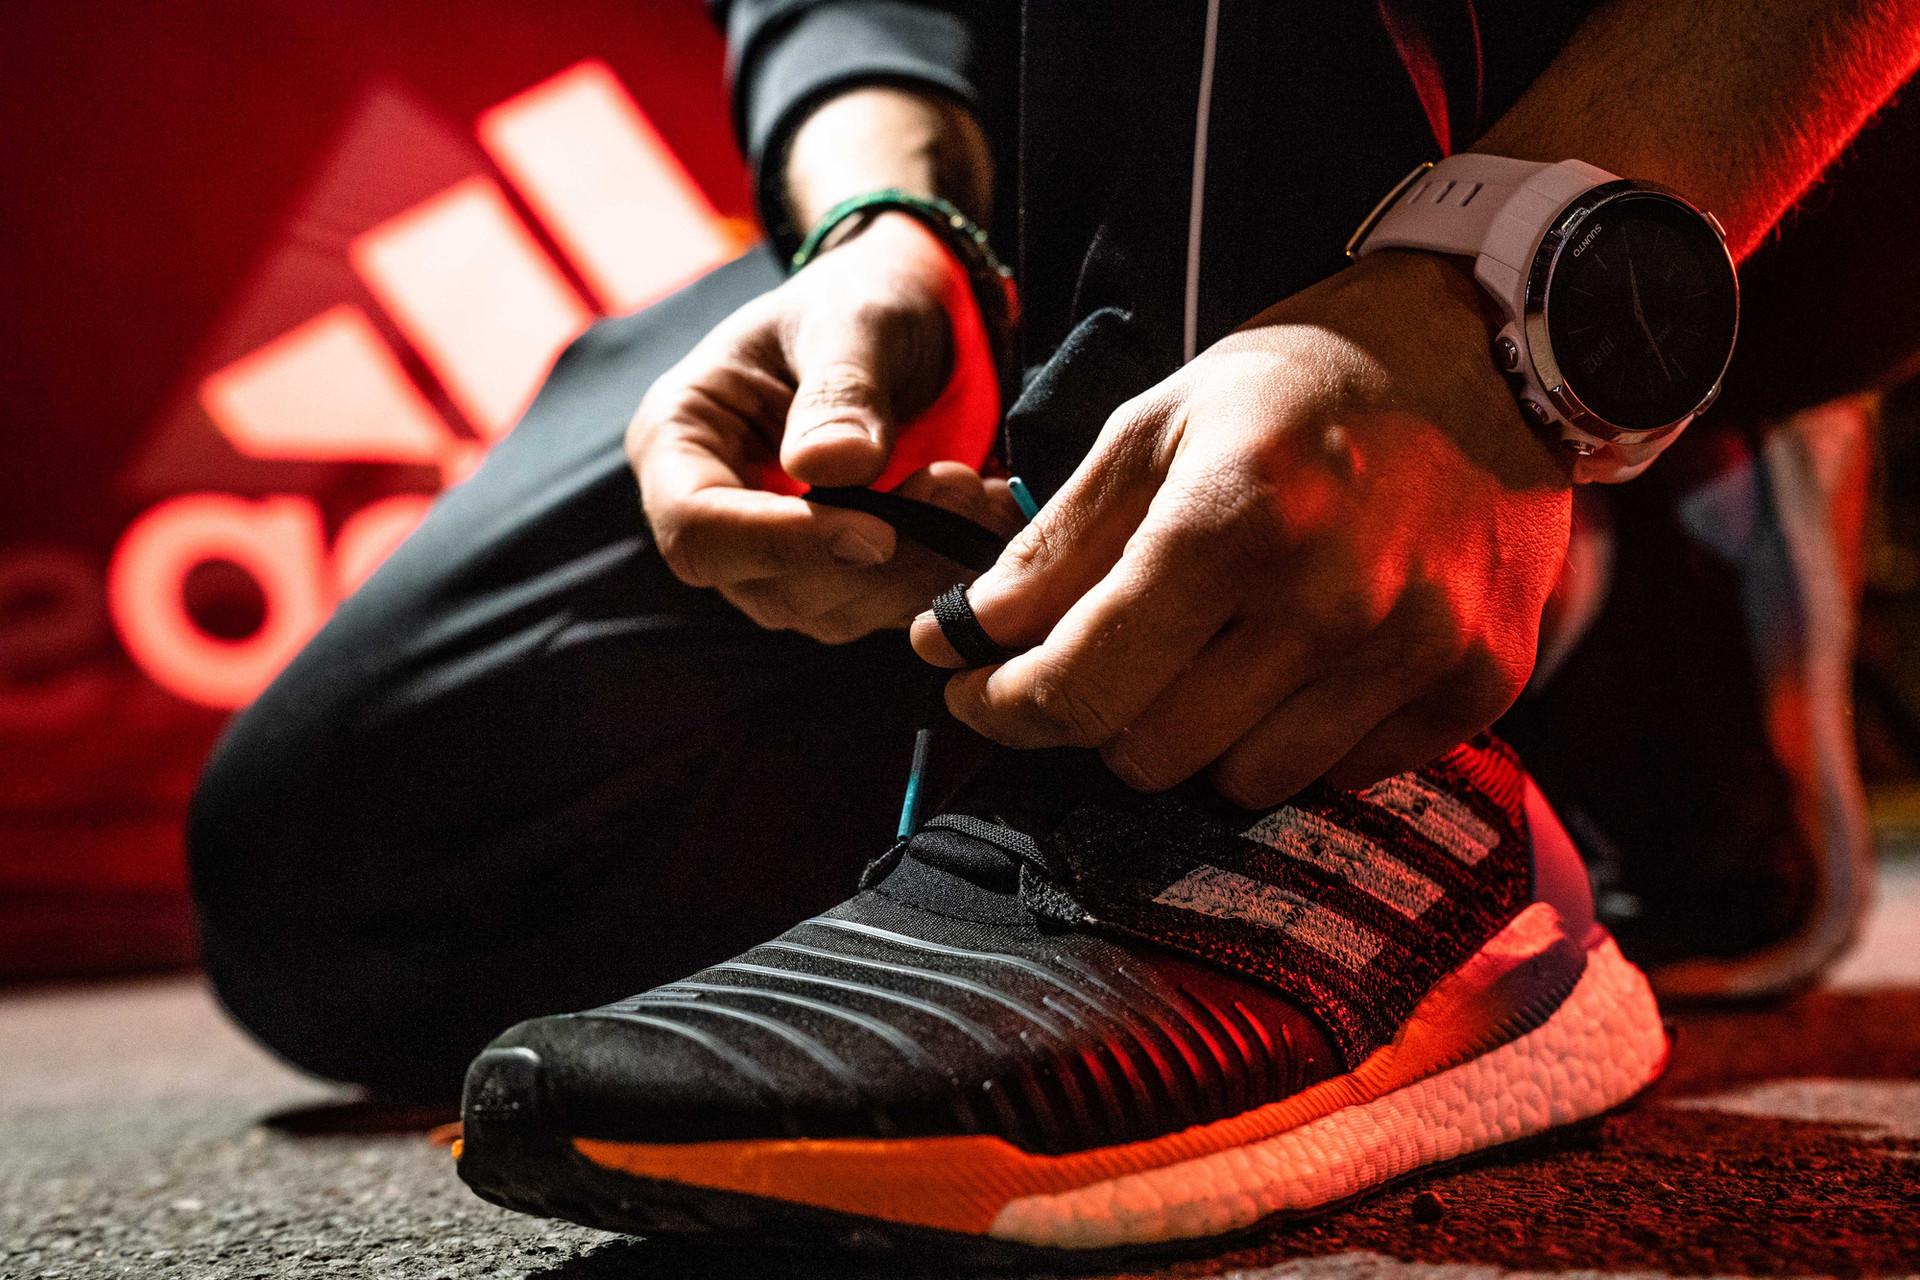 Adidas5K (23 of 84).jpg